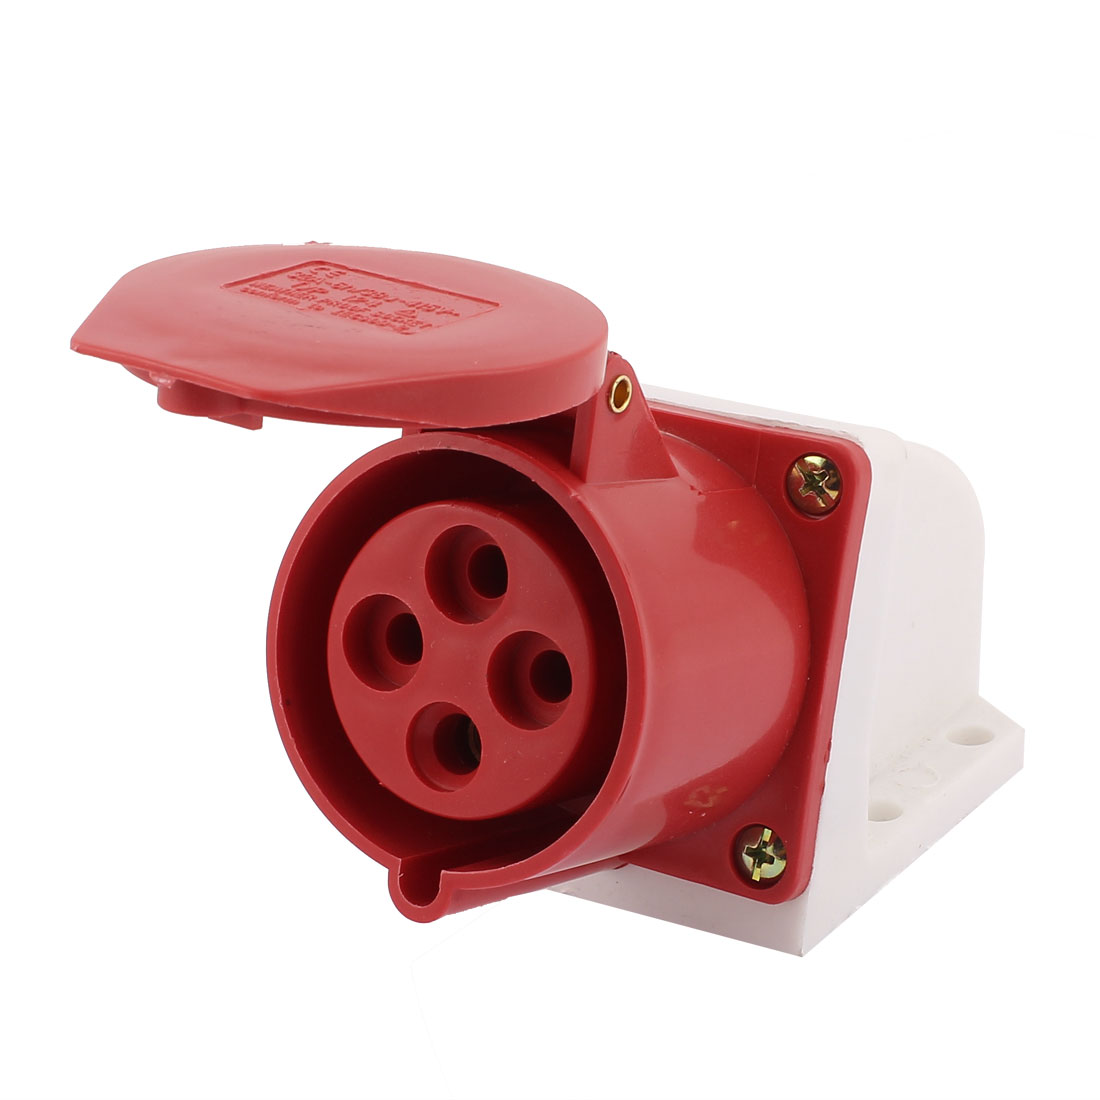 AC 380V-415V 32A IP44 3P+E 4P Female Industrial Caravan Waterproof Socket